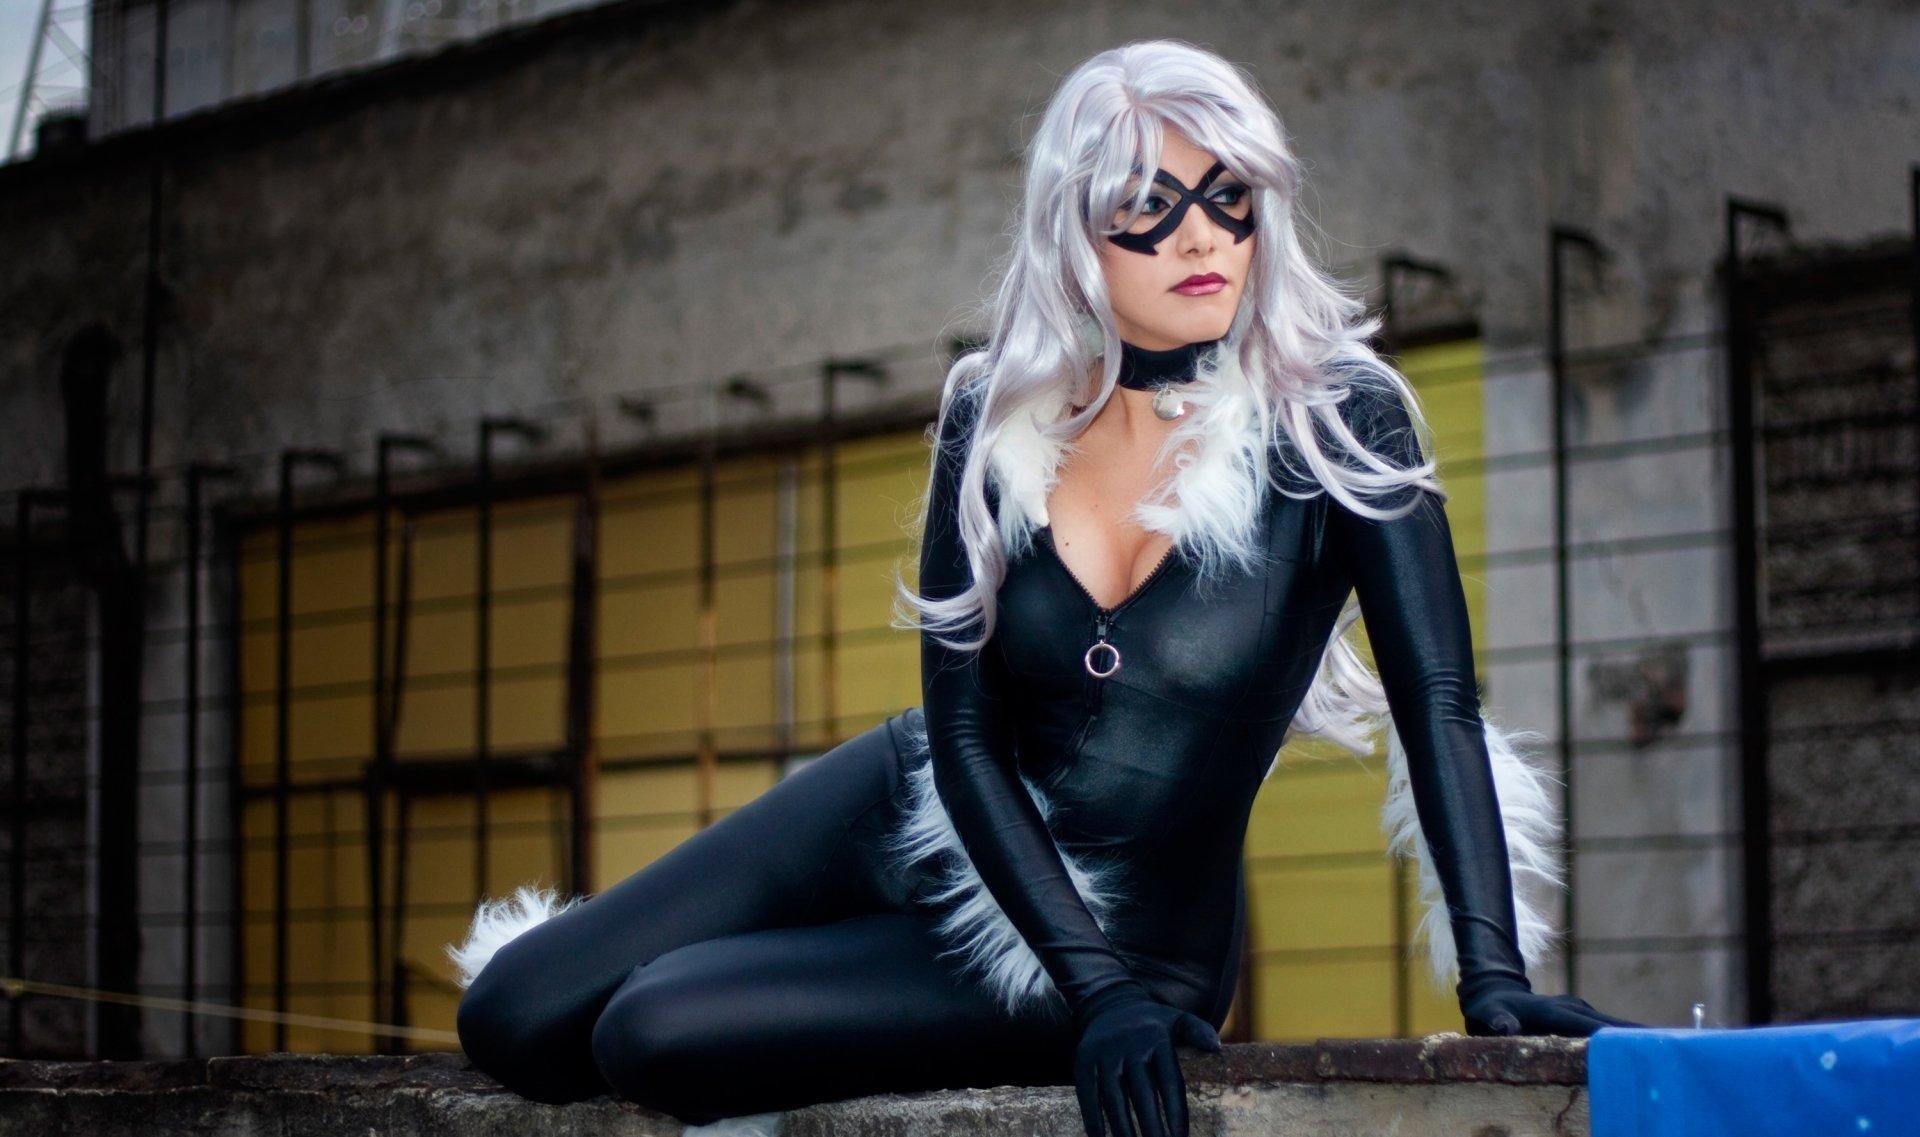 756508 Title Women Cosplay Black Cat Wallpaper Black Cat Marvel Cosplay 1920x1137 Download Hd Wallpaper Wallpapertip